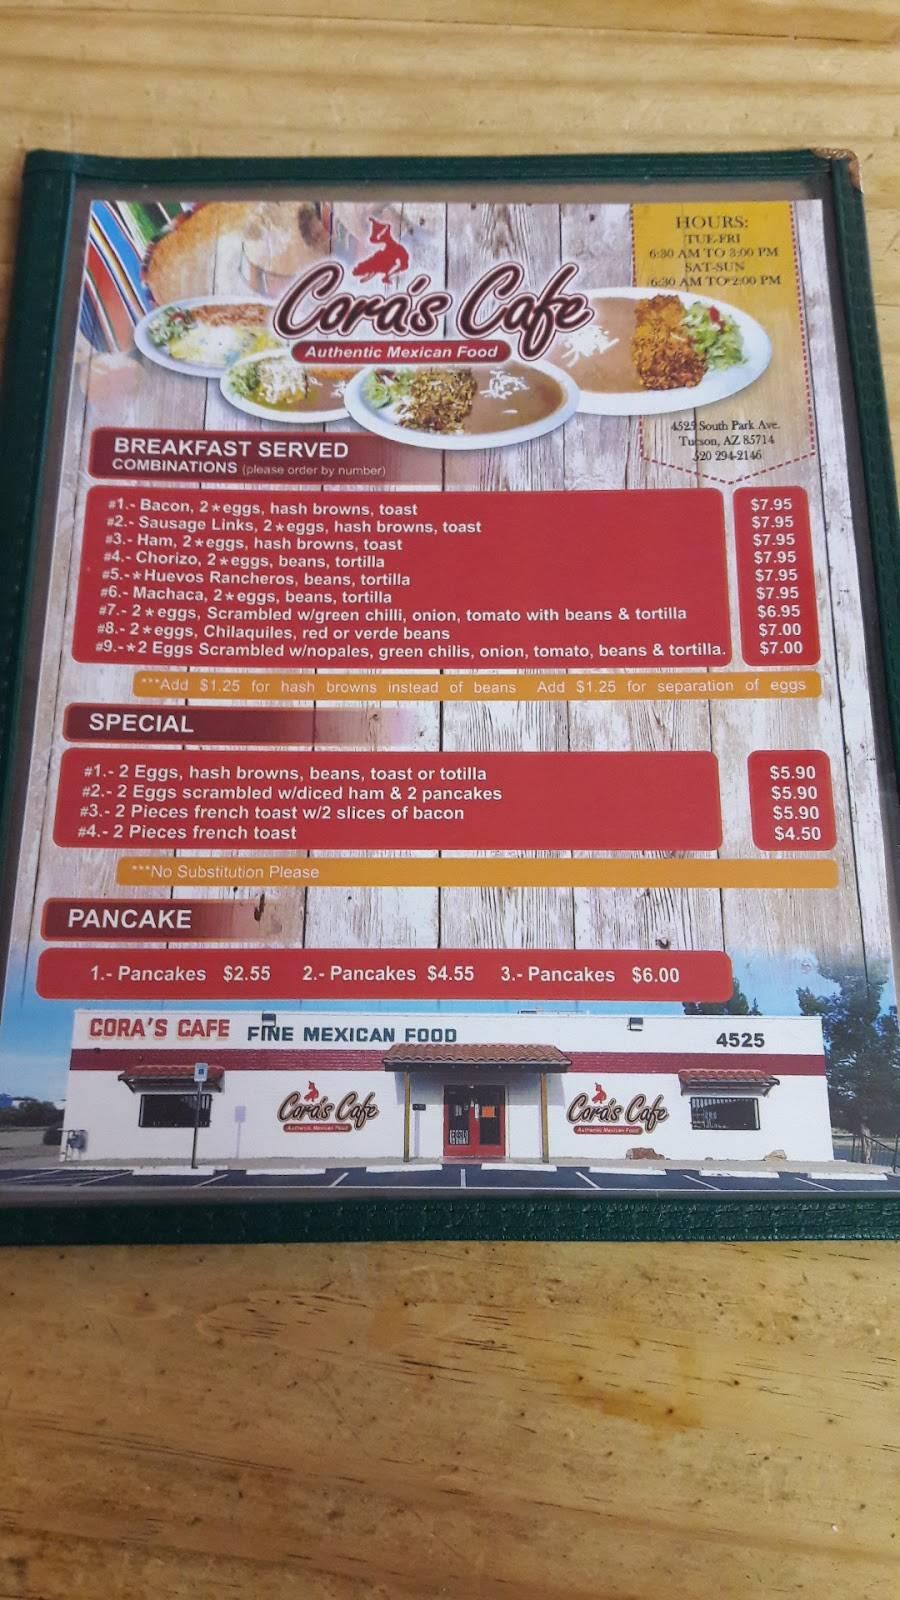 Coras Cafe - restaurant    Photo 10 of 10   Address: 4525 S Park Ave, Tucson, AZ 85714, USA   Phone: (520) 294-2146